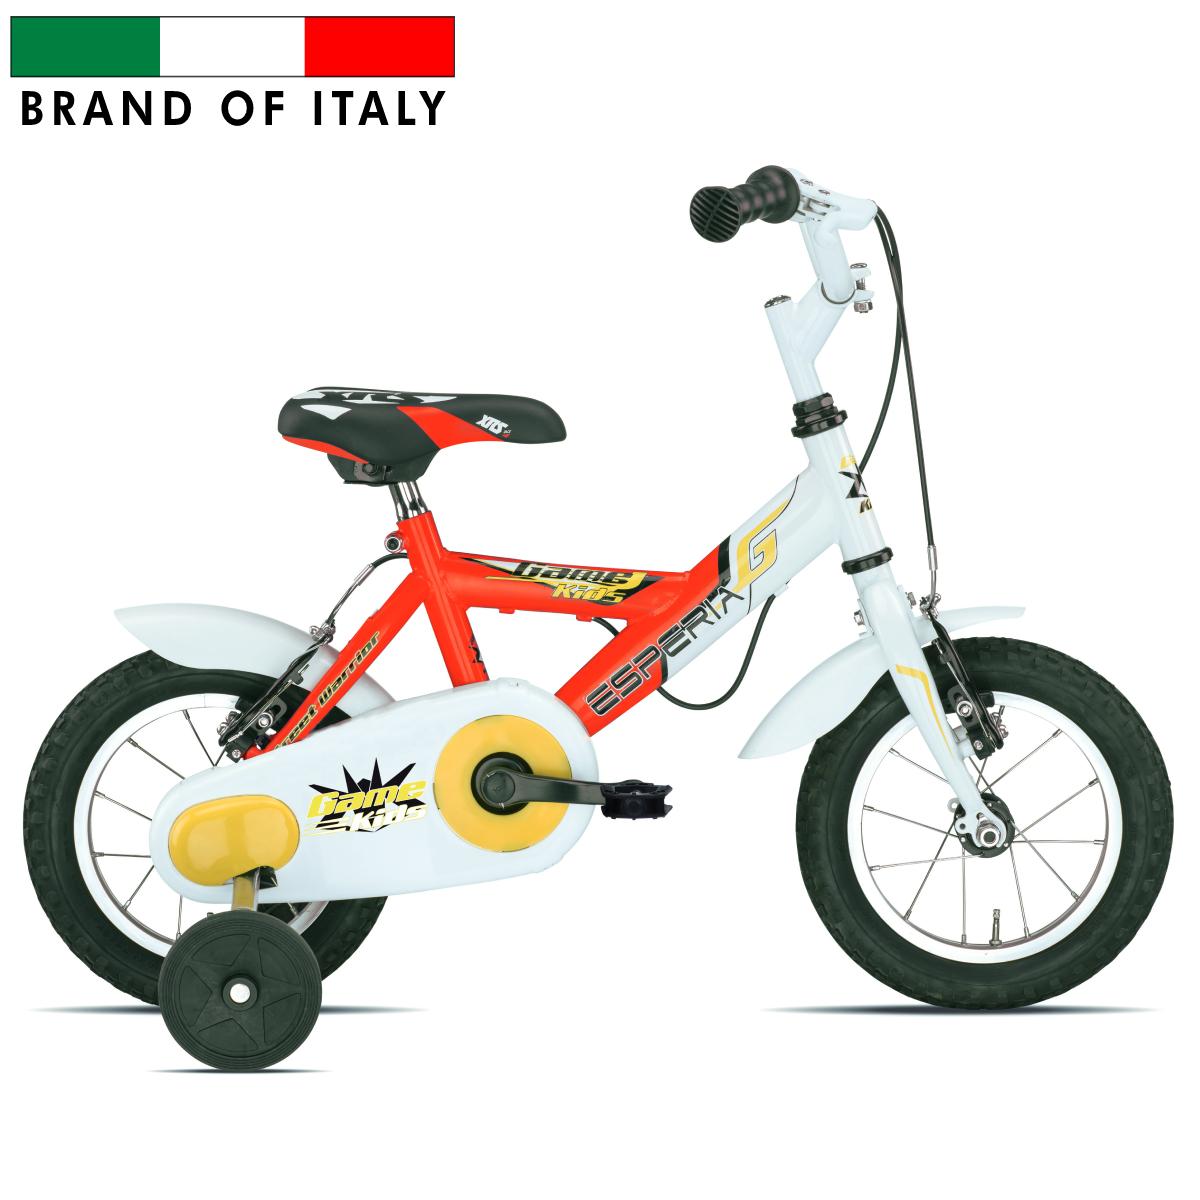 ESPERIA 9900 MASCOTTE MTB12 RED 109900U1 Pilsētas velosipēds